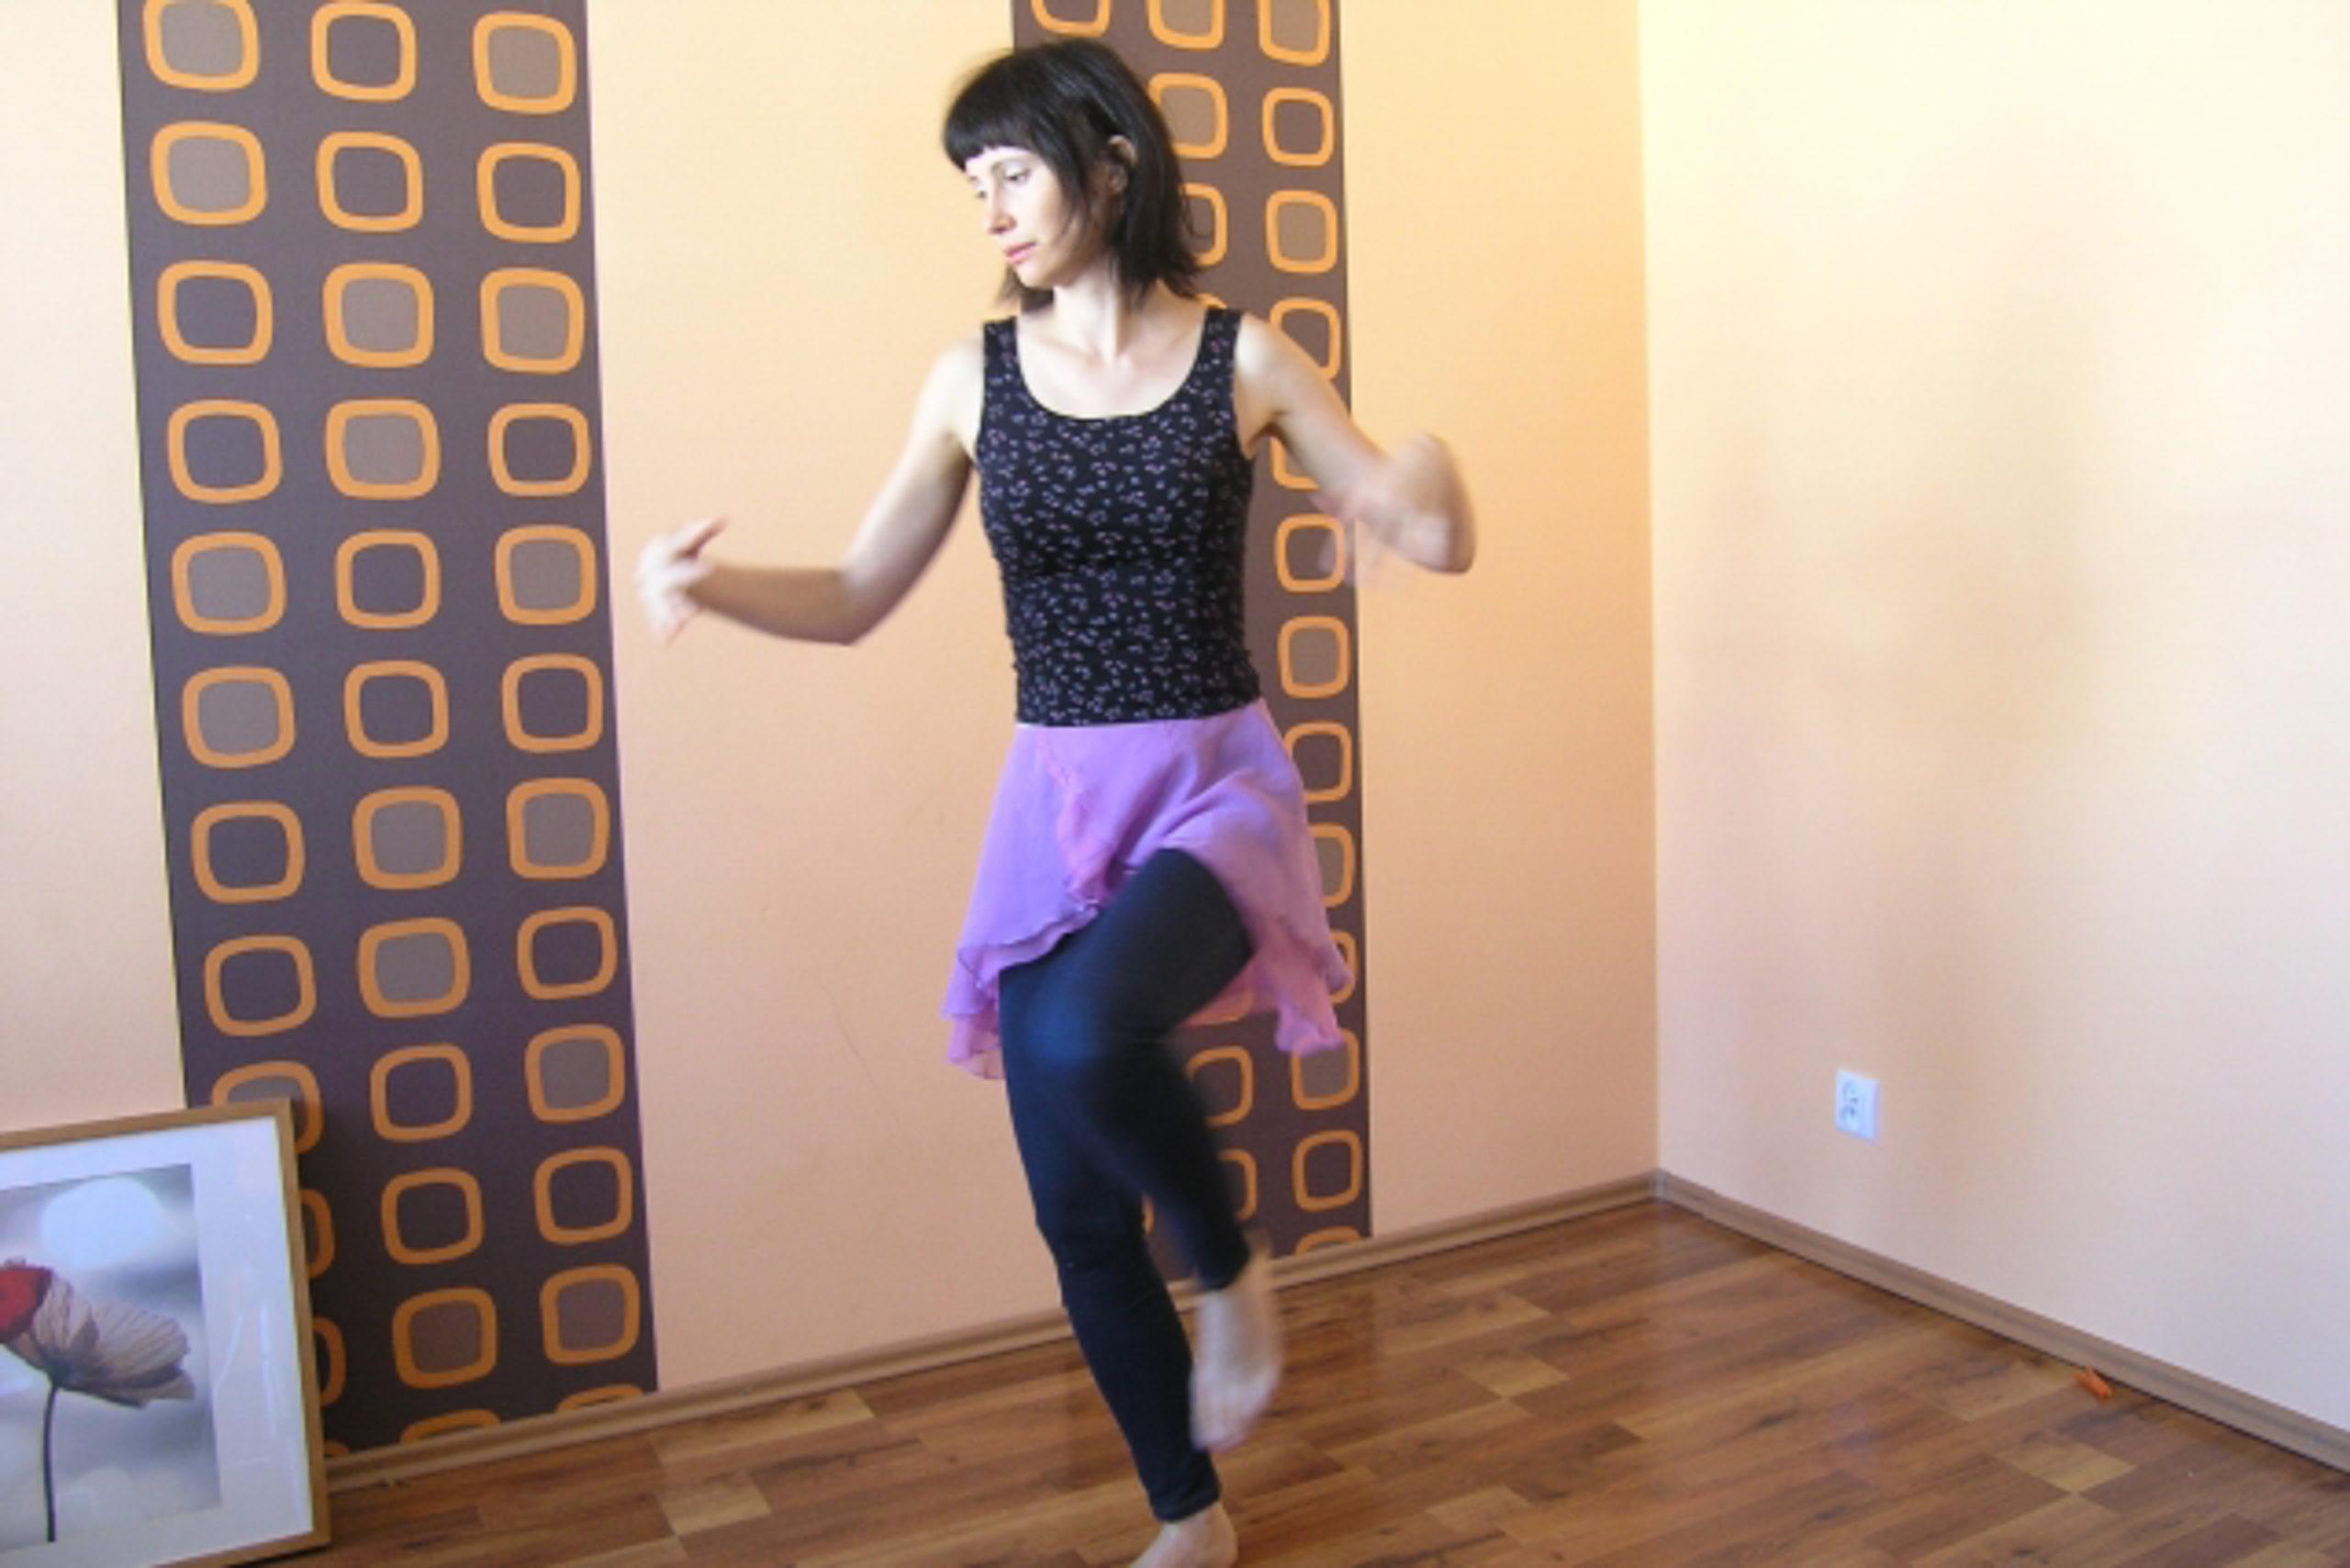 Violetta tańczy